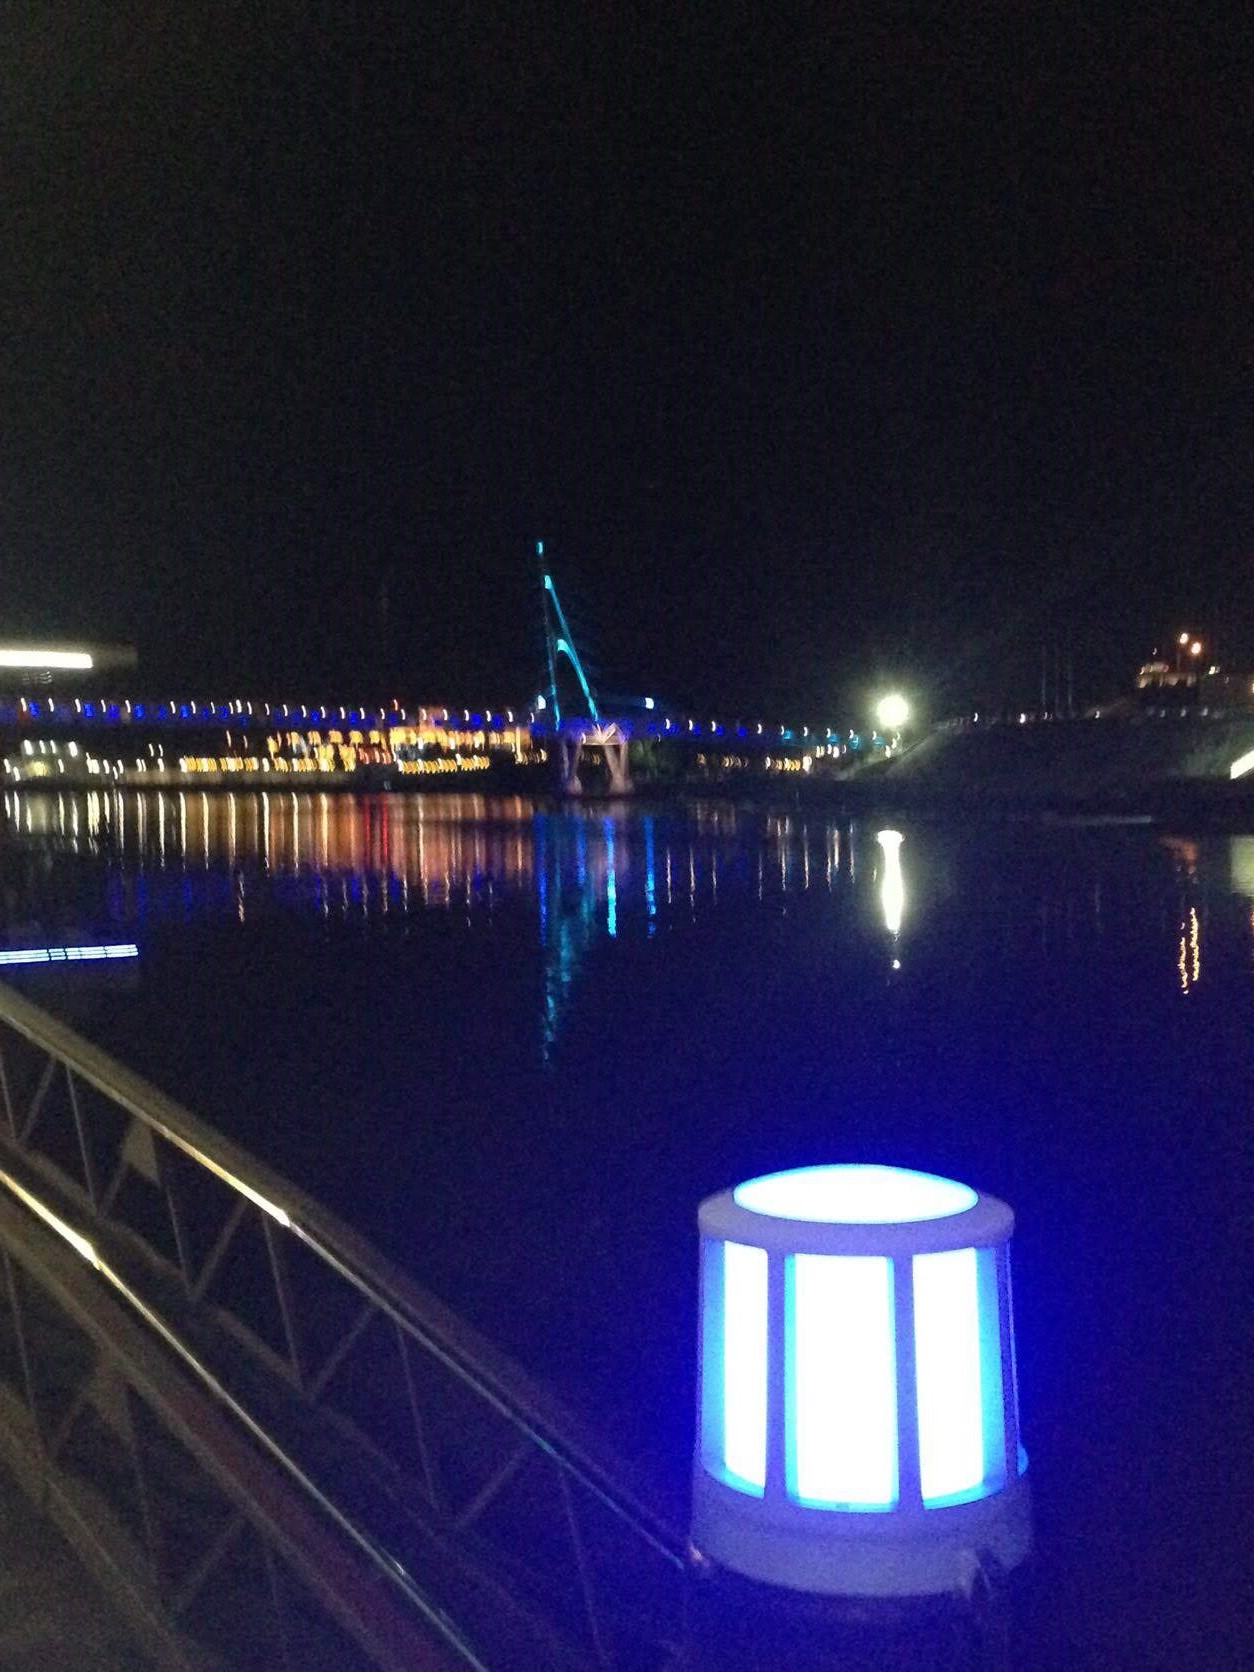 The River Promenade by night in Kuching